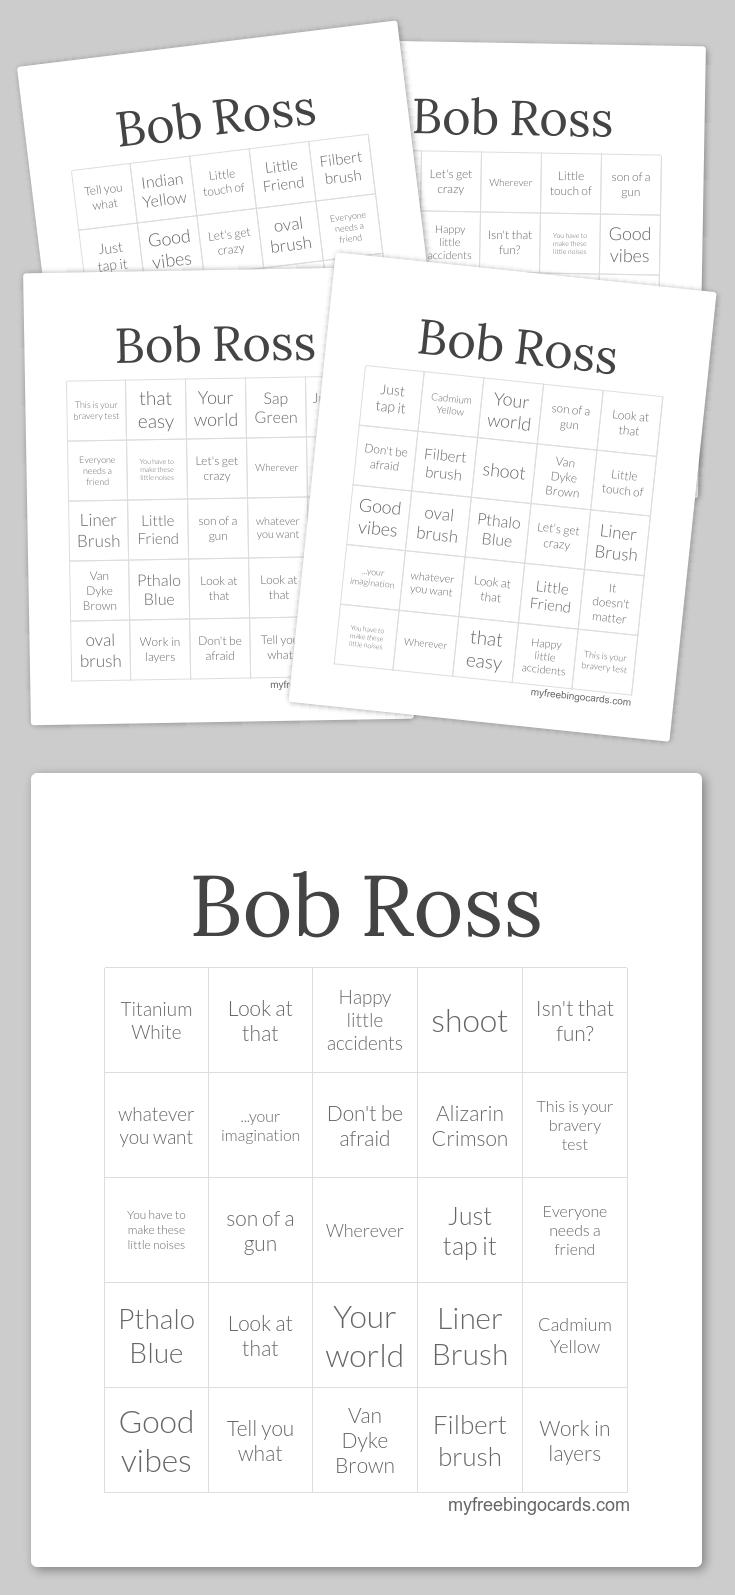 Bob Ross Bingo Bingo Cards Printable Free Printable Bingo Cards Bingo Cards